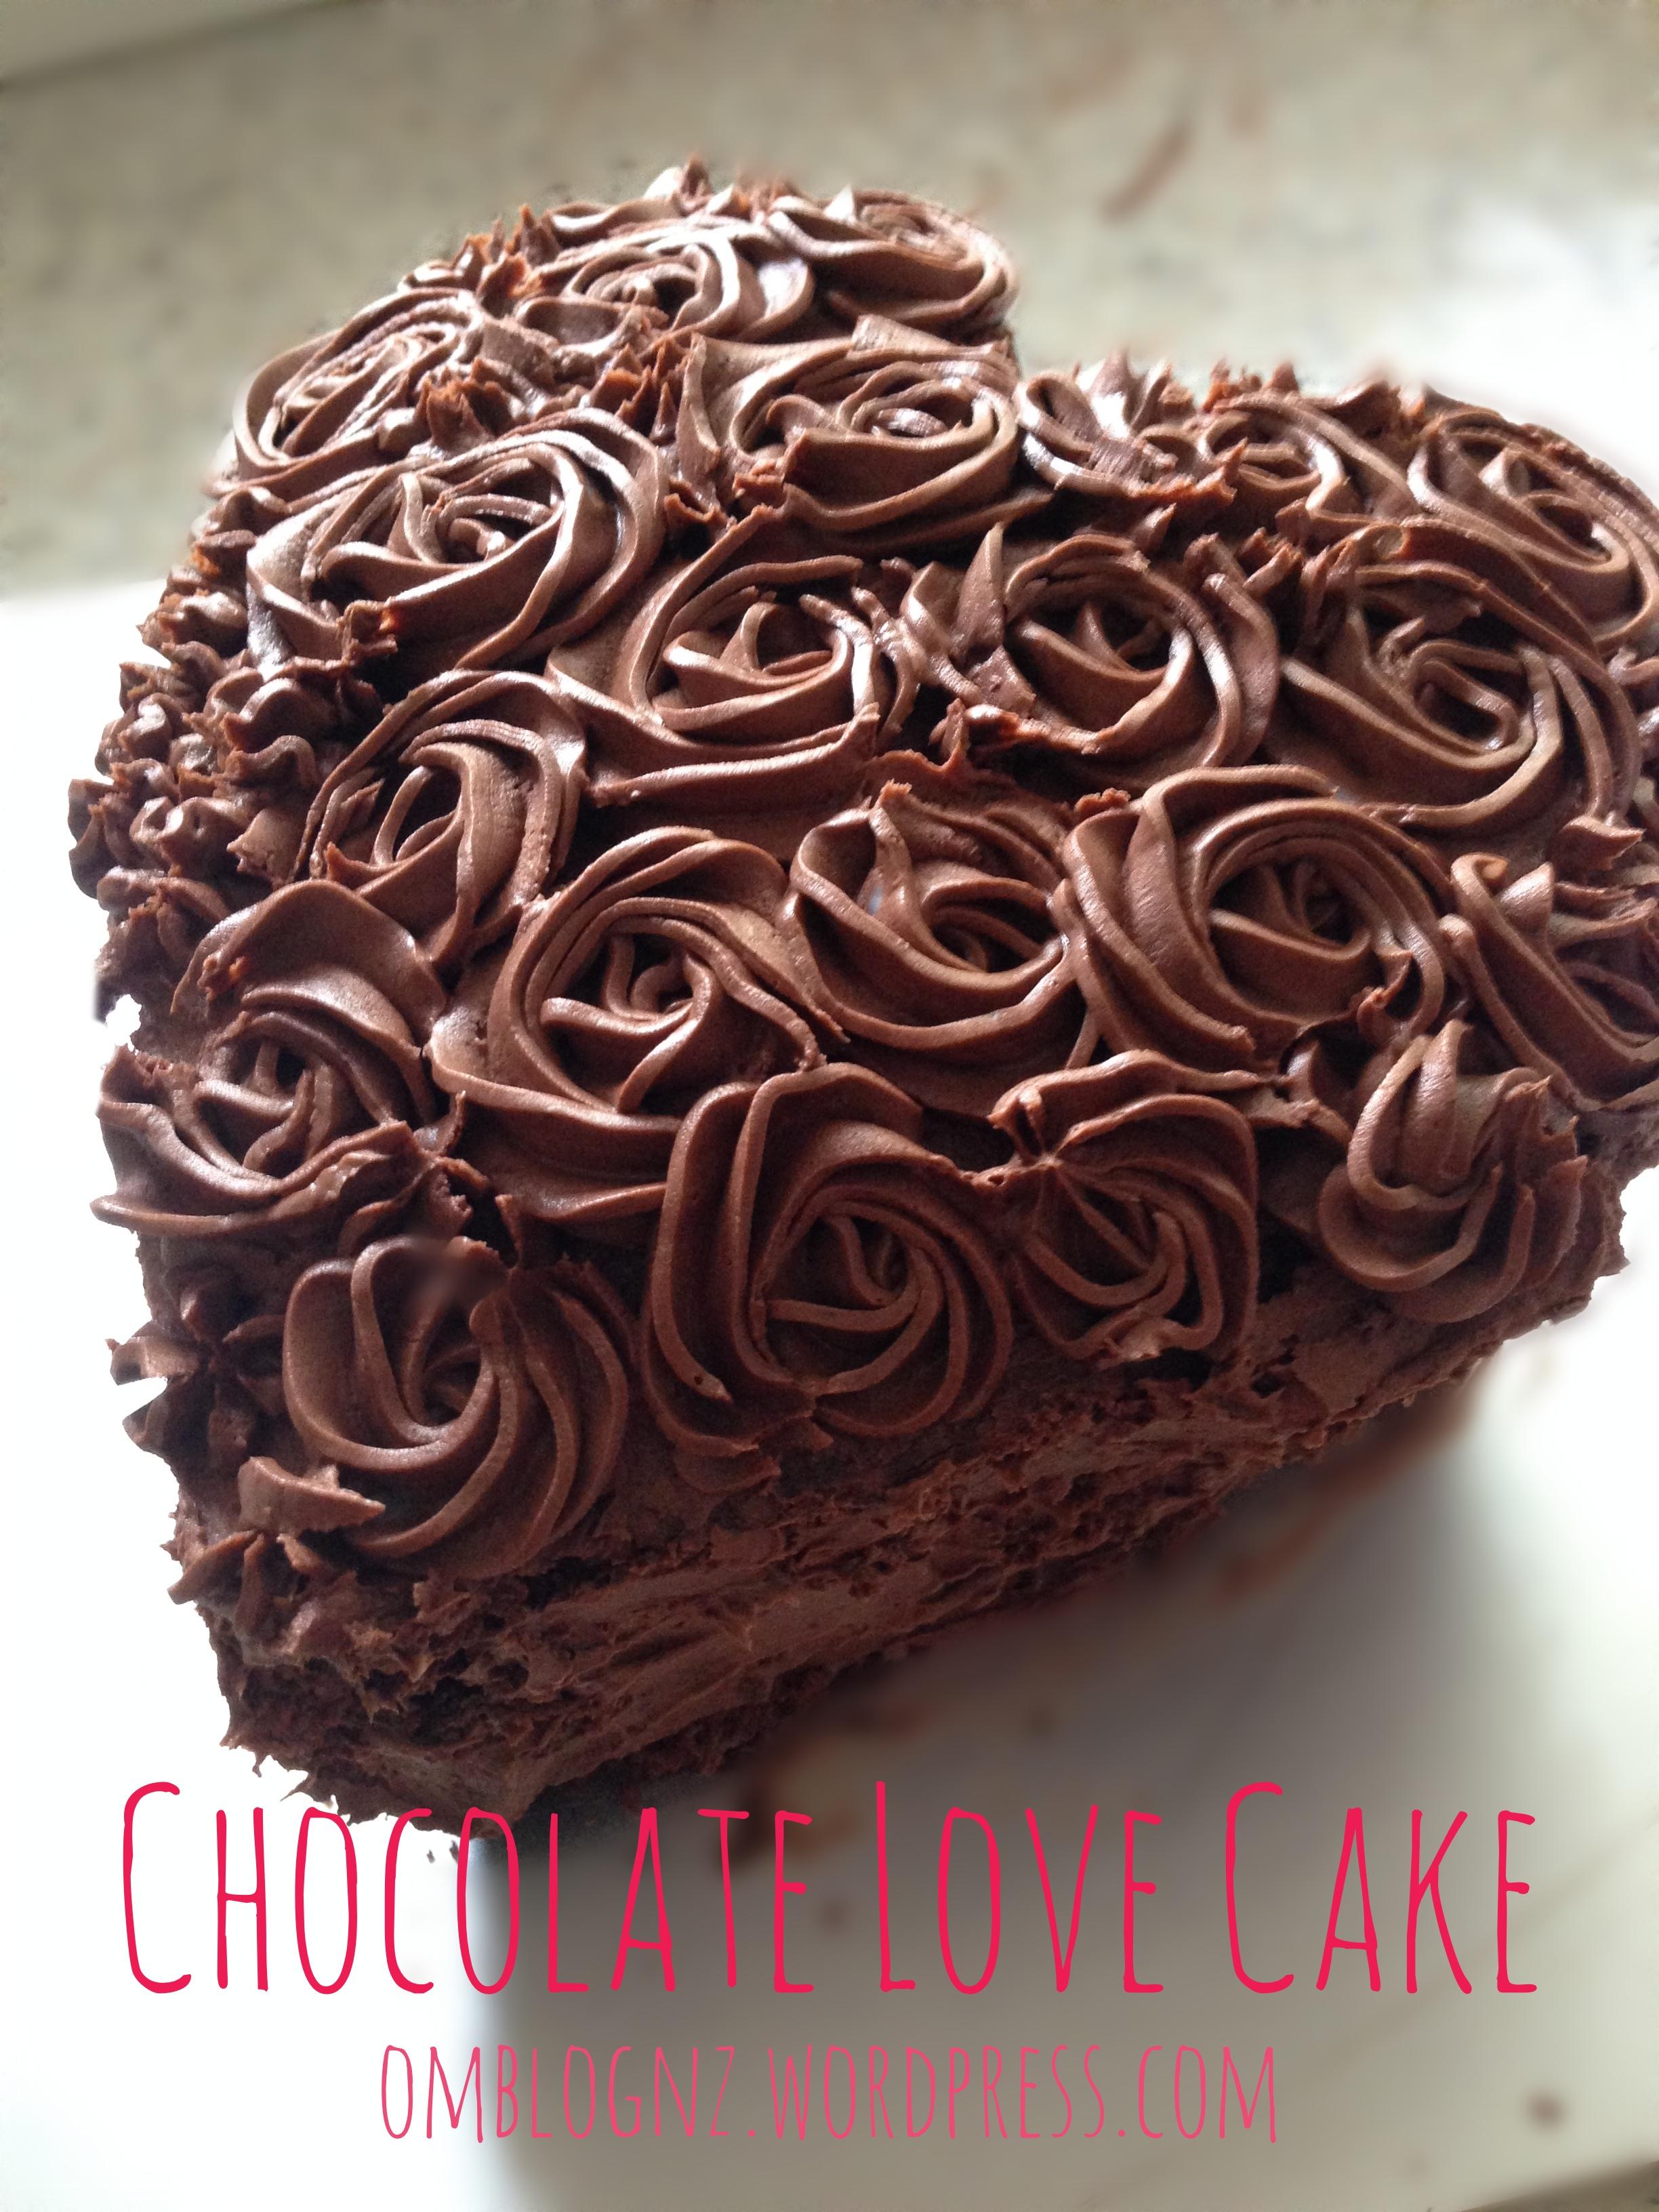 Chocolate Love Cake Images : Gluten Free Chocolate Love Cake   omBlog